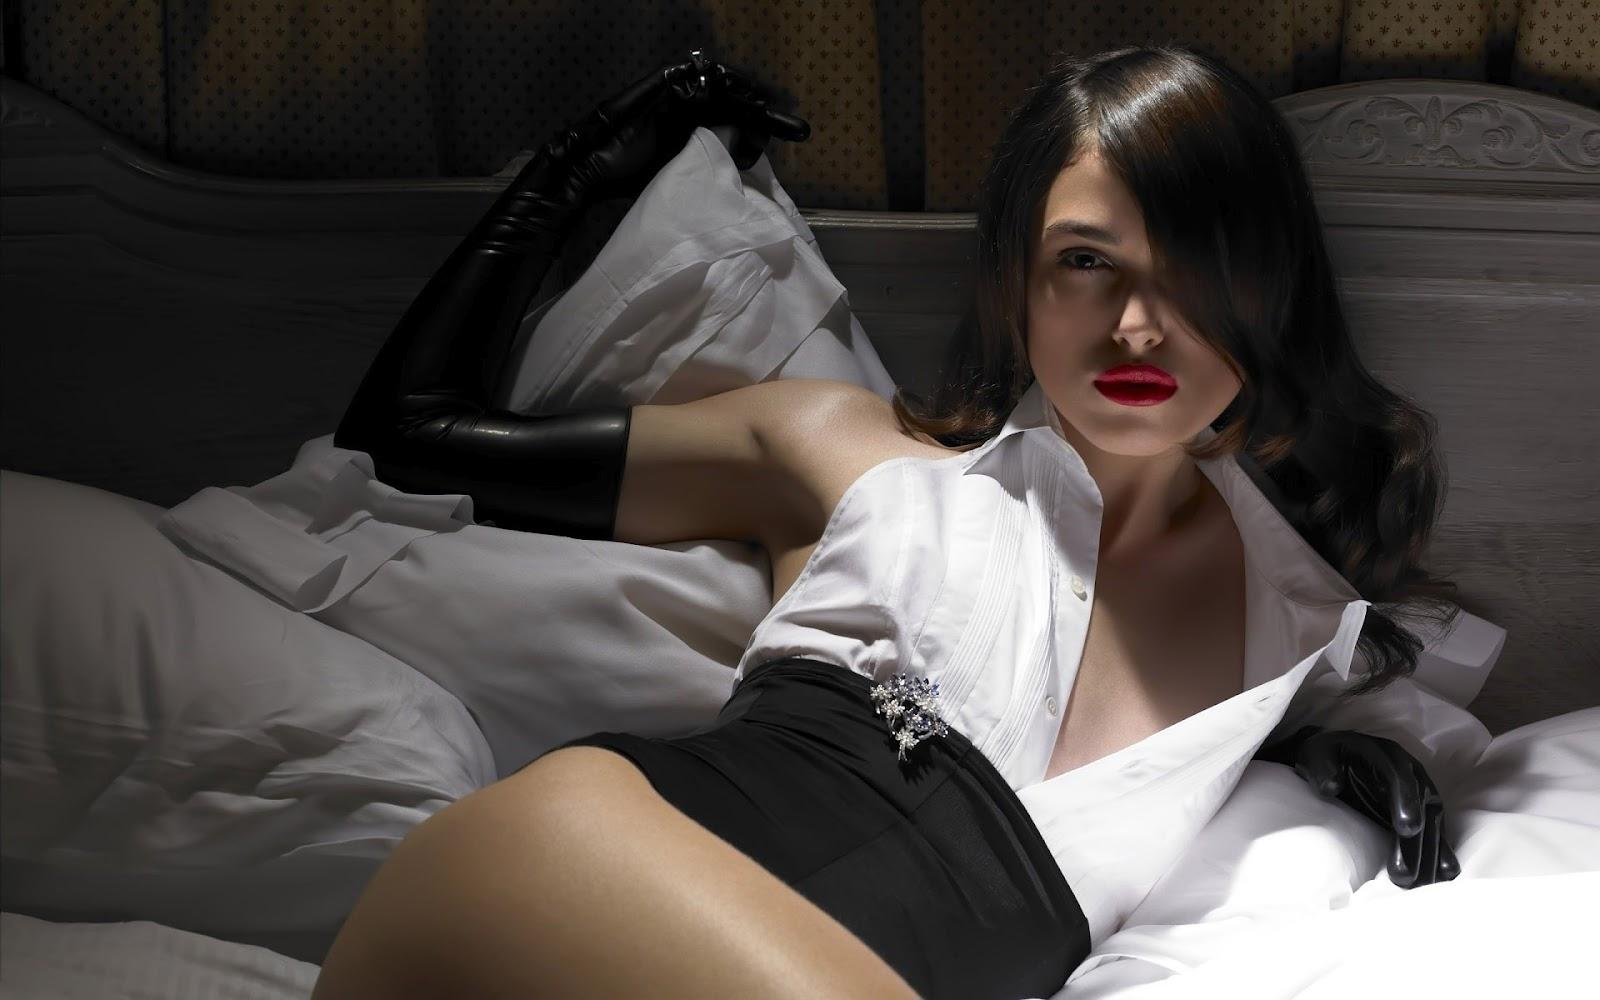 http://4.bp.blogspot.com/-06QgB0BruQs/UFyIwMatGkI/AAAAAAAASvI/wRqoU5egzPI/s1600/Keira+Knightley+Hot+Wallpapers+-+21.jpg